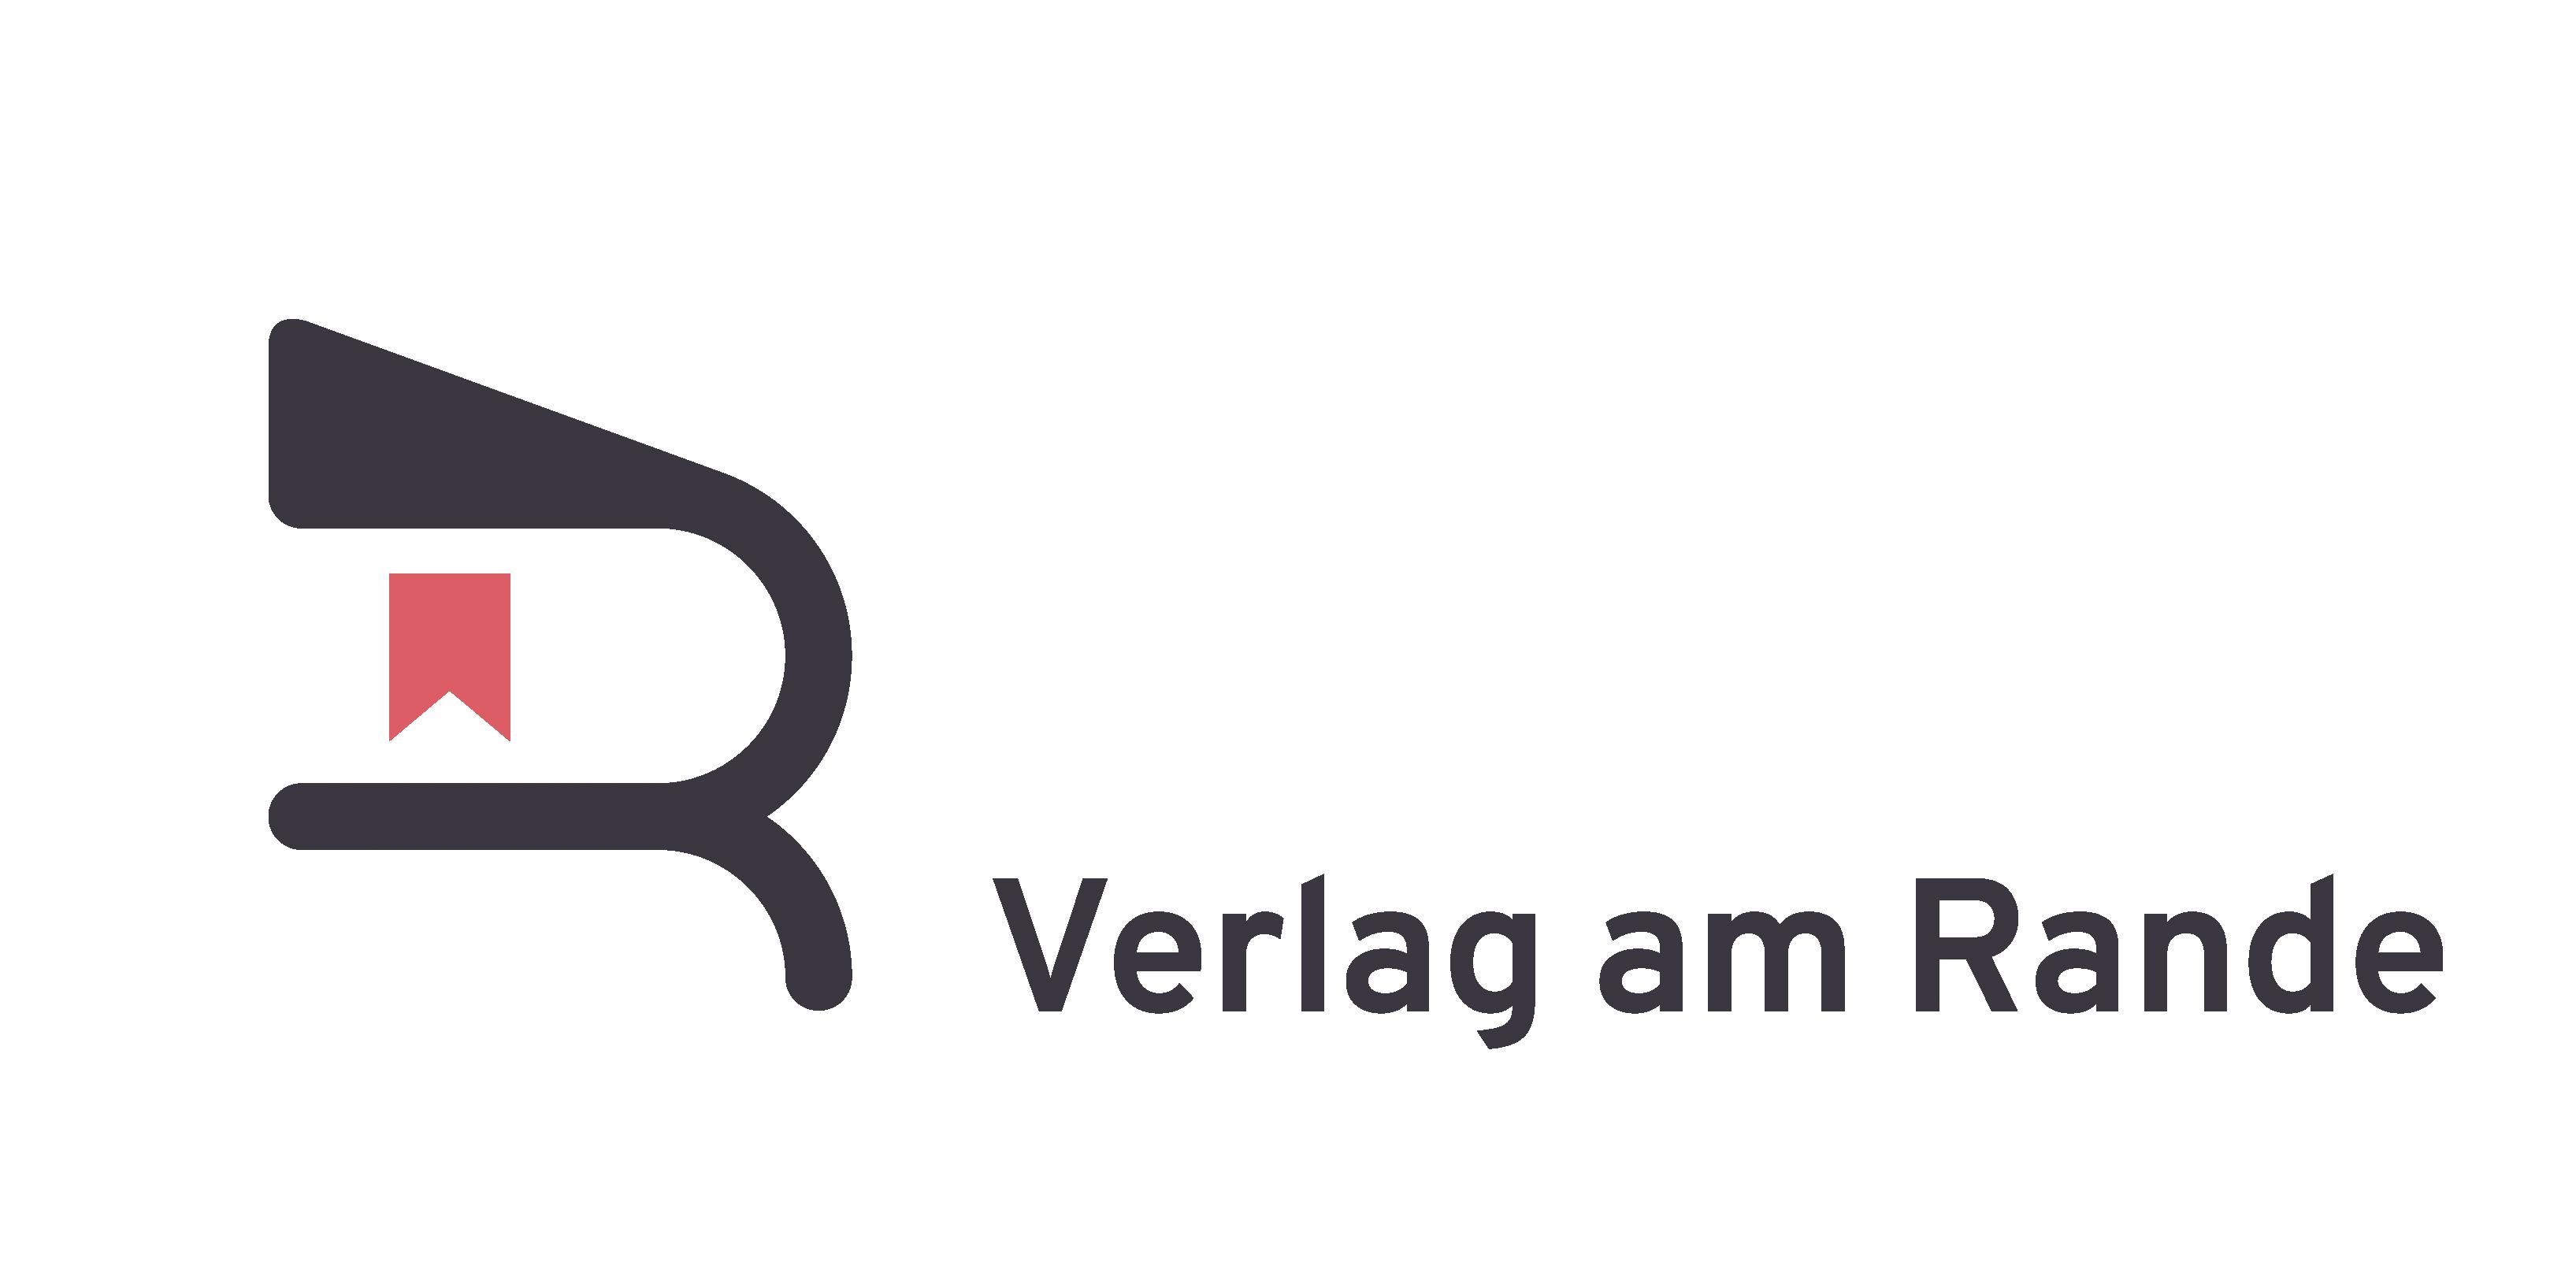 Verlag am Rande